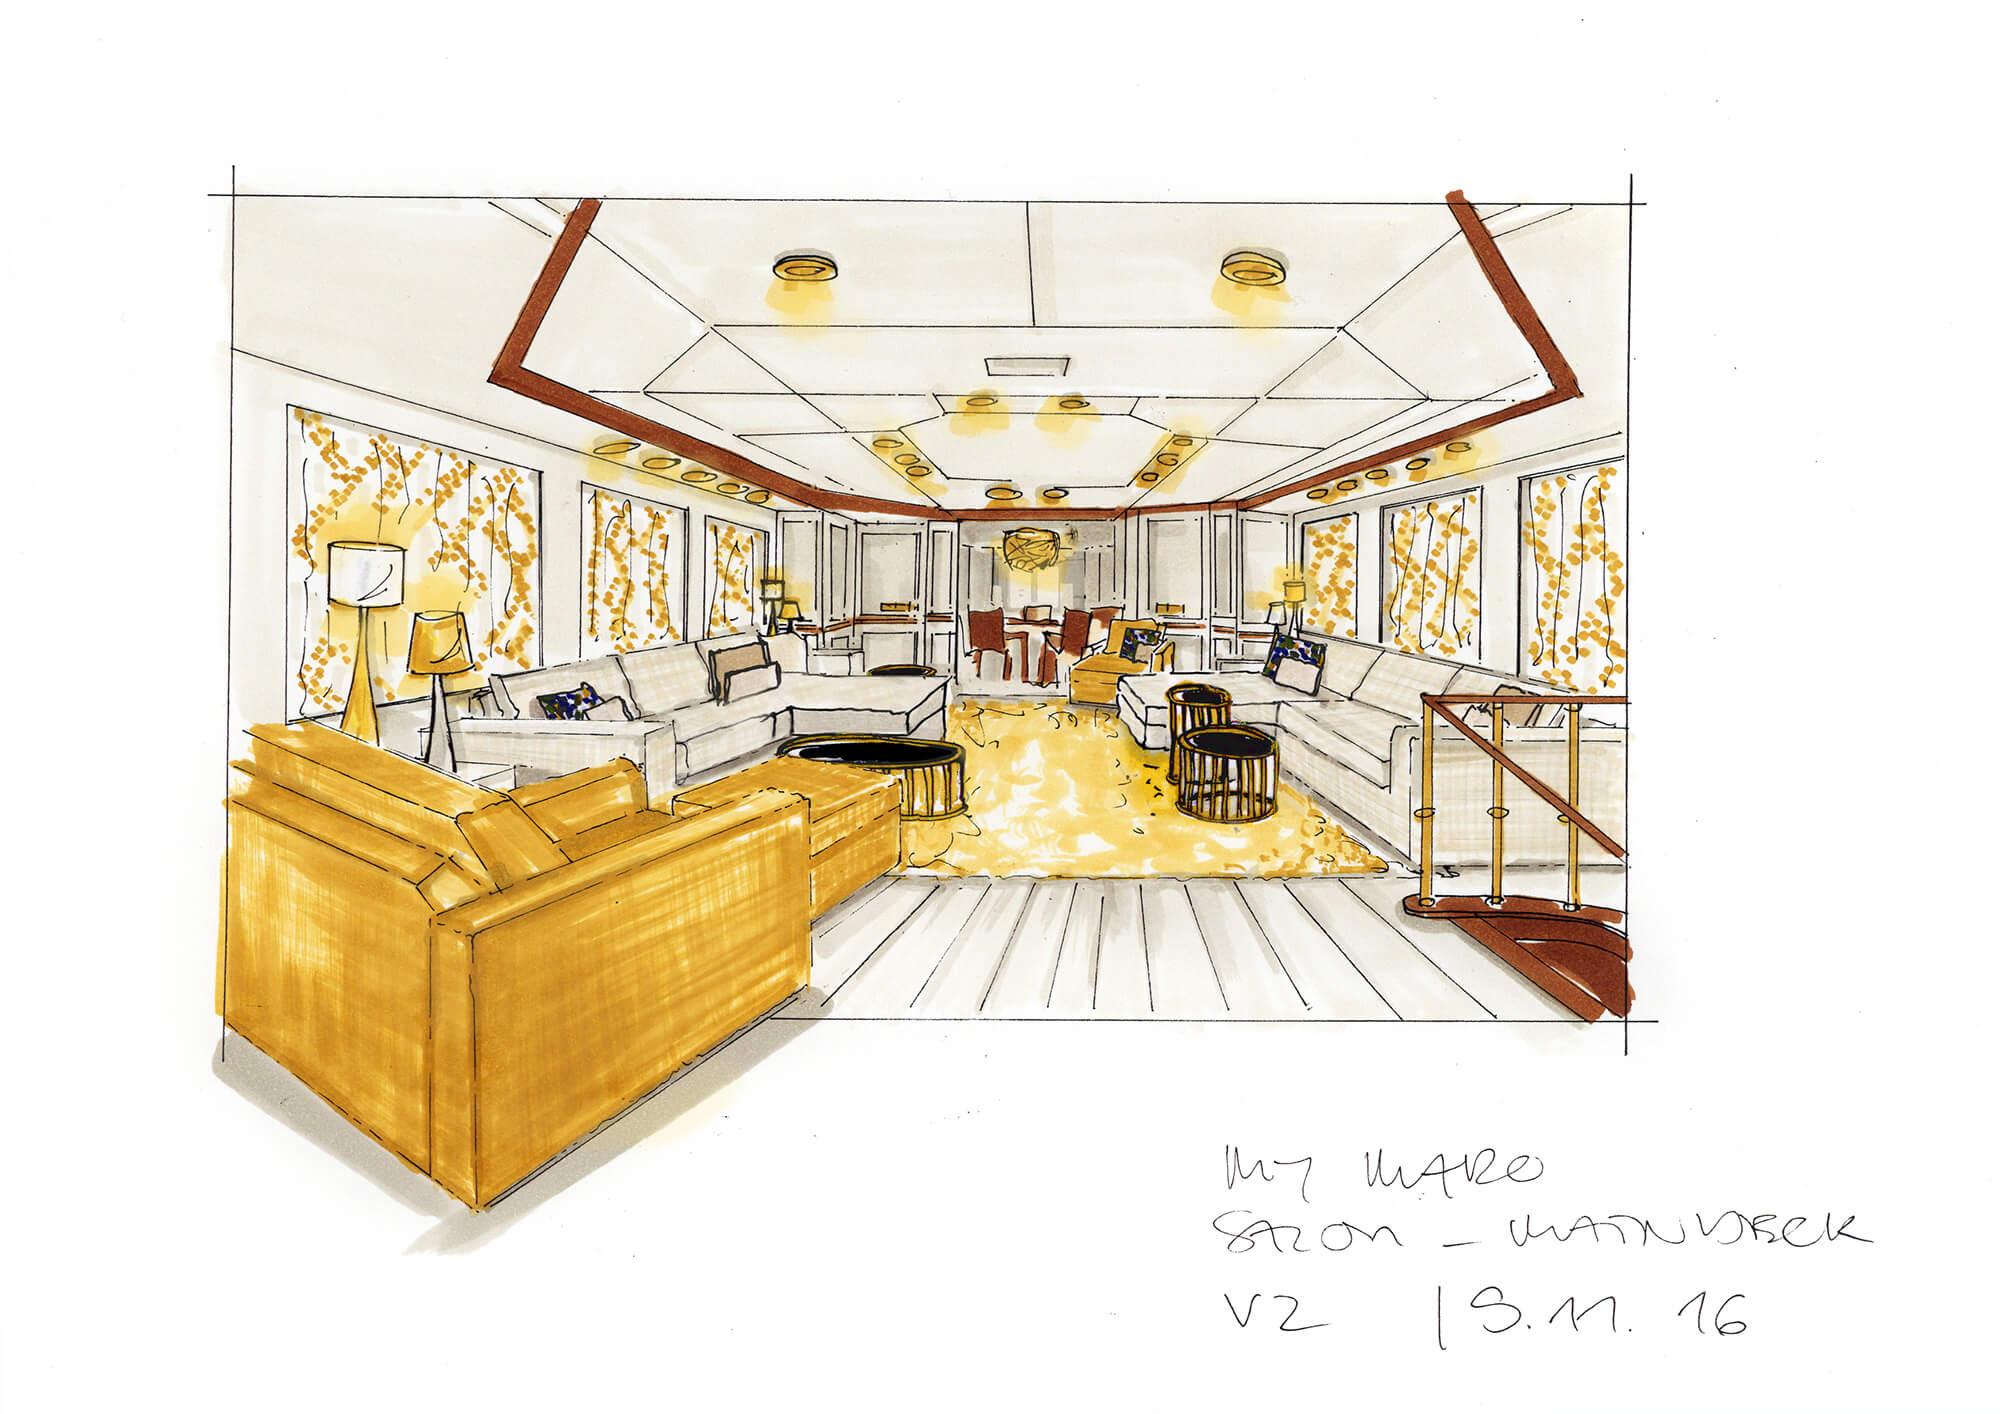 25 years of interior design